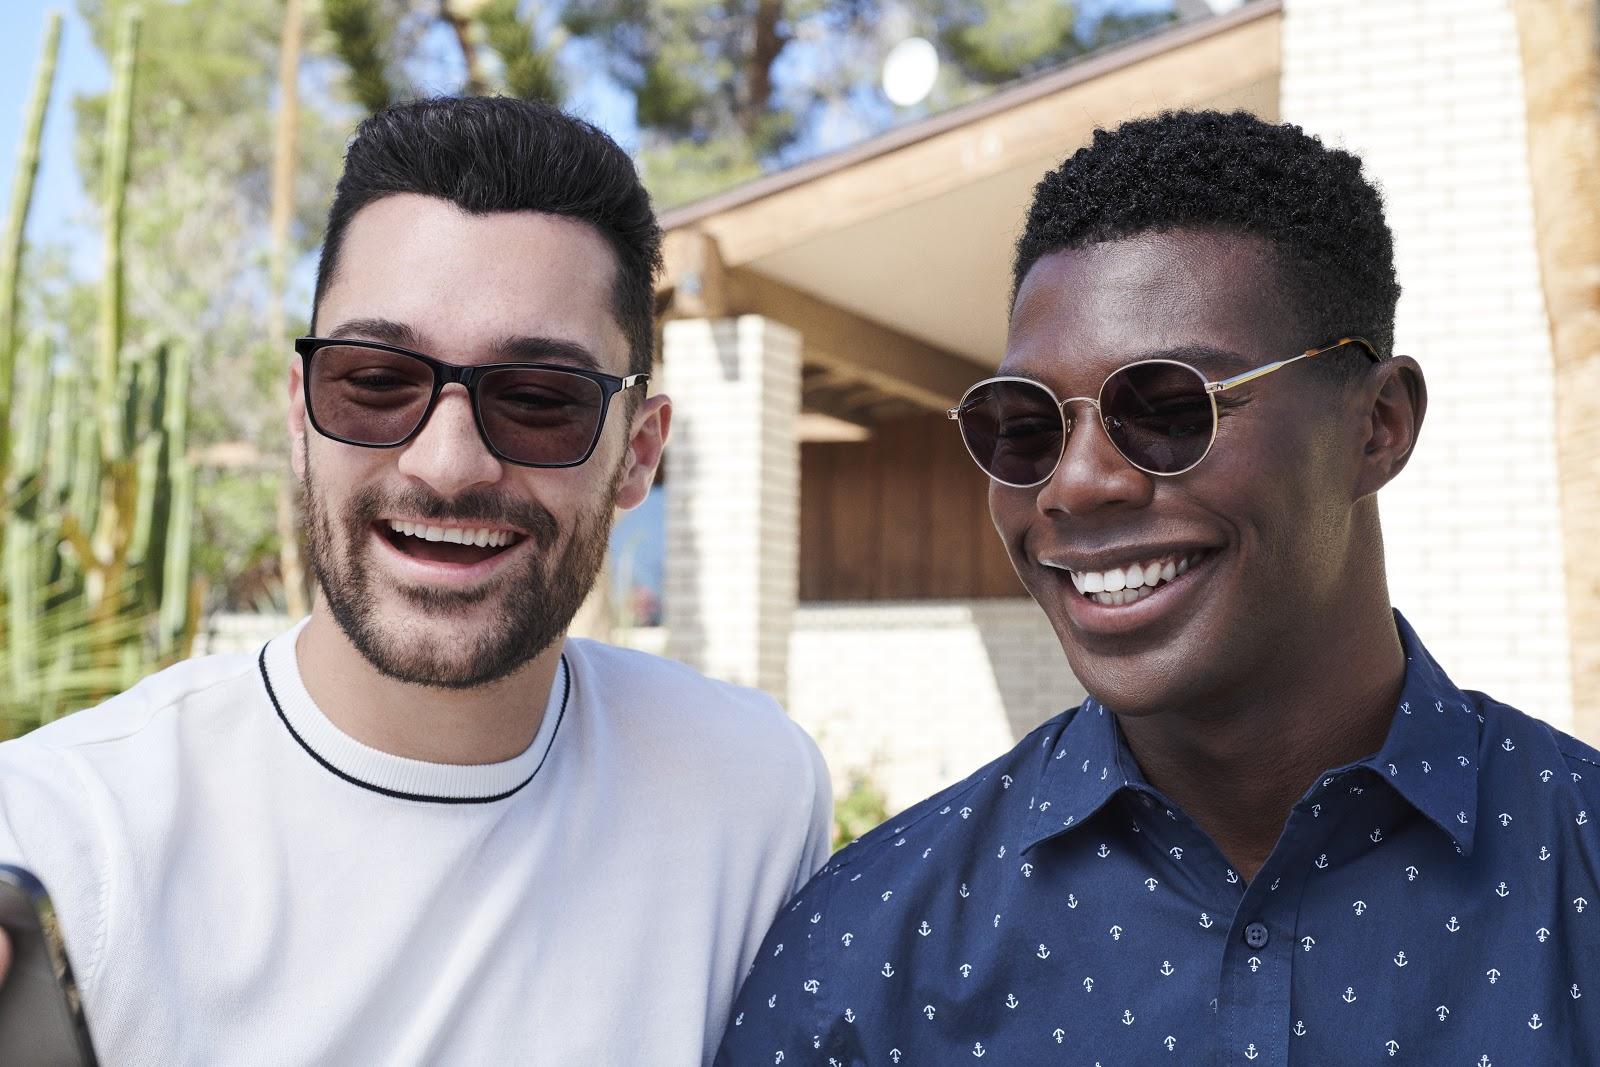 Two men wearing glasses for bigger noses